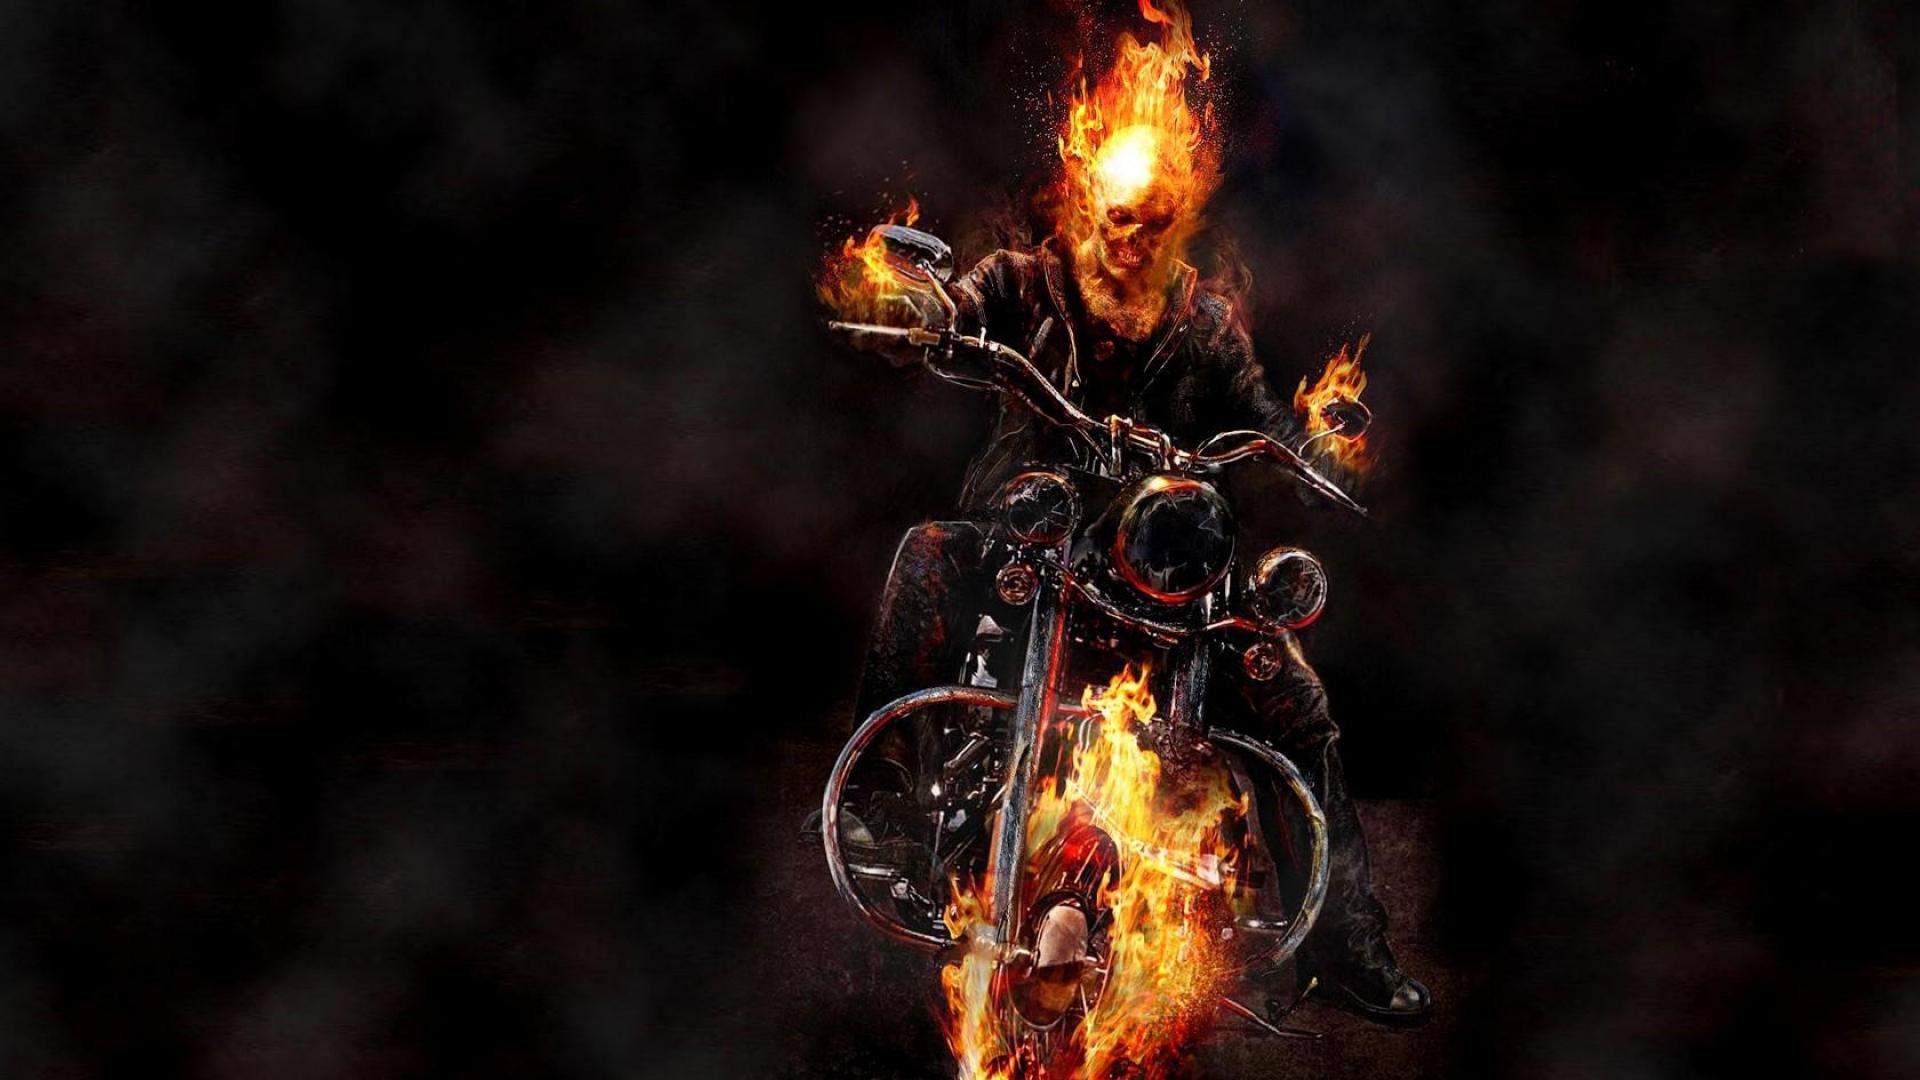 Motorcycle Ghost Rider Image HD Wallpaper WallpaperLepi 1920x1080